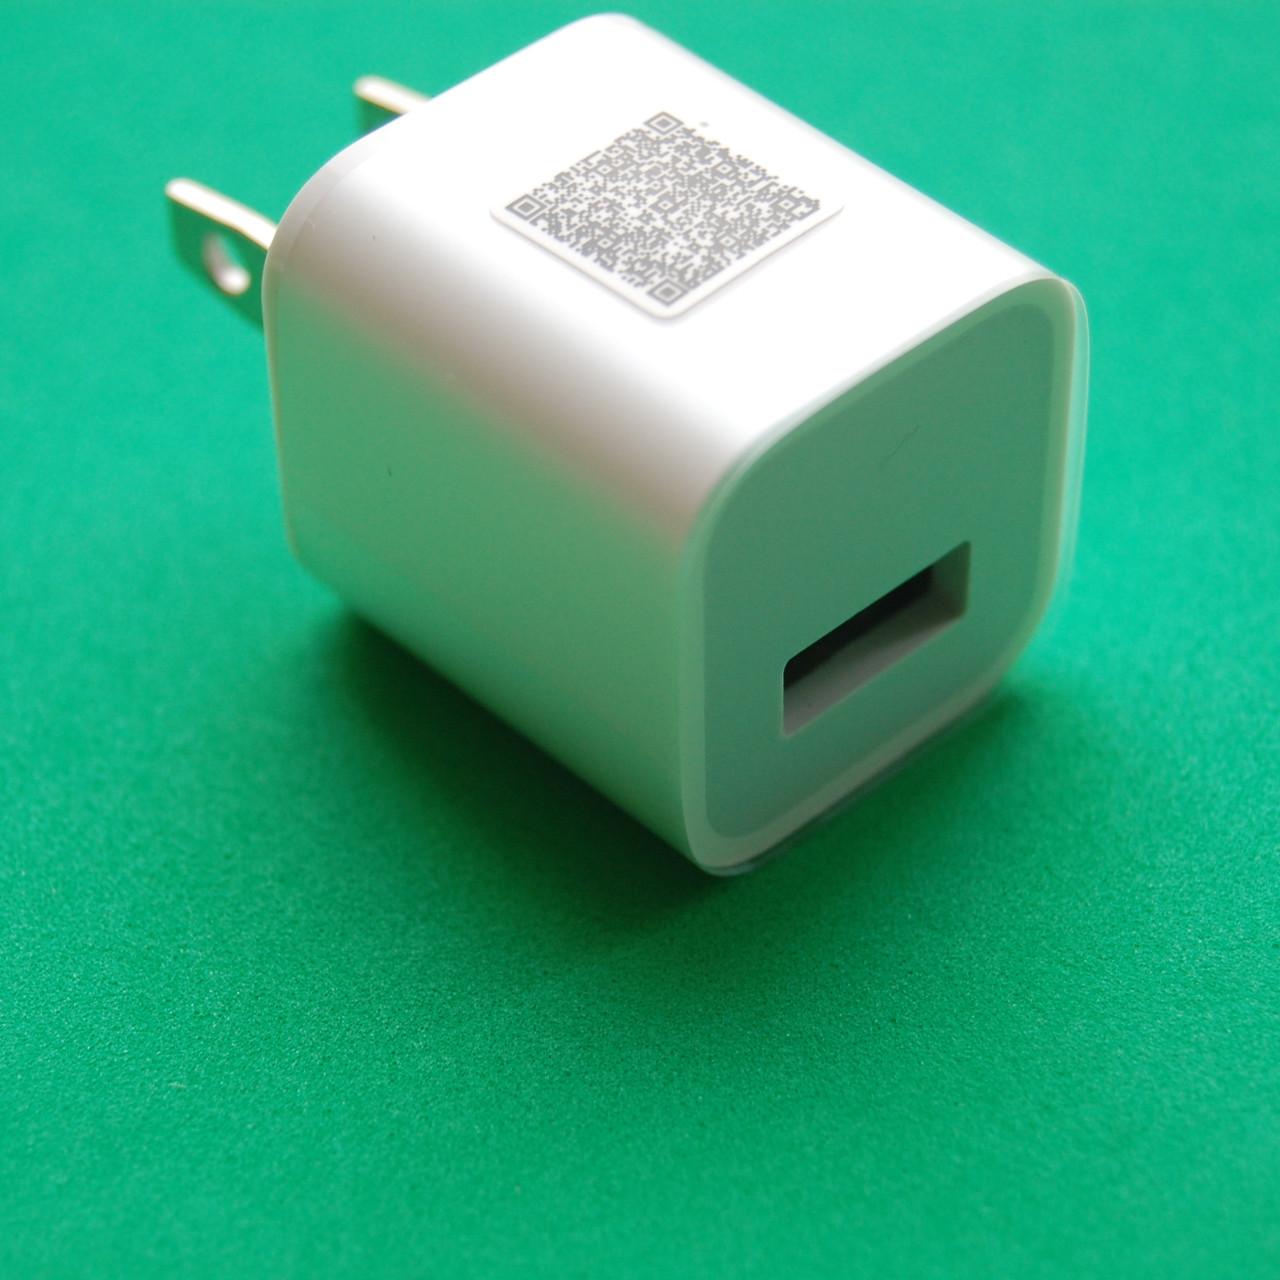 СЗУ для Apple iPhone (Американская вилка) 1000mAh Оригинал